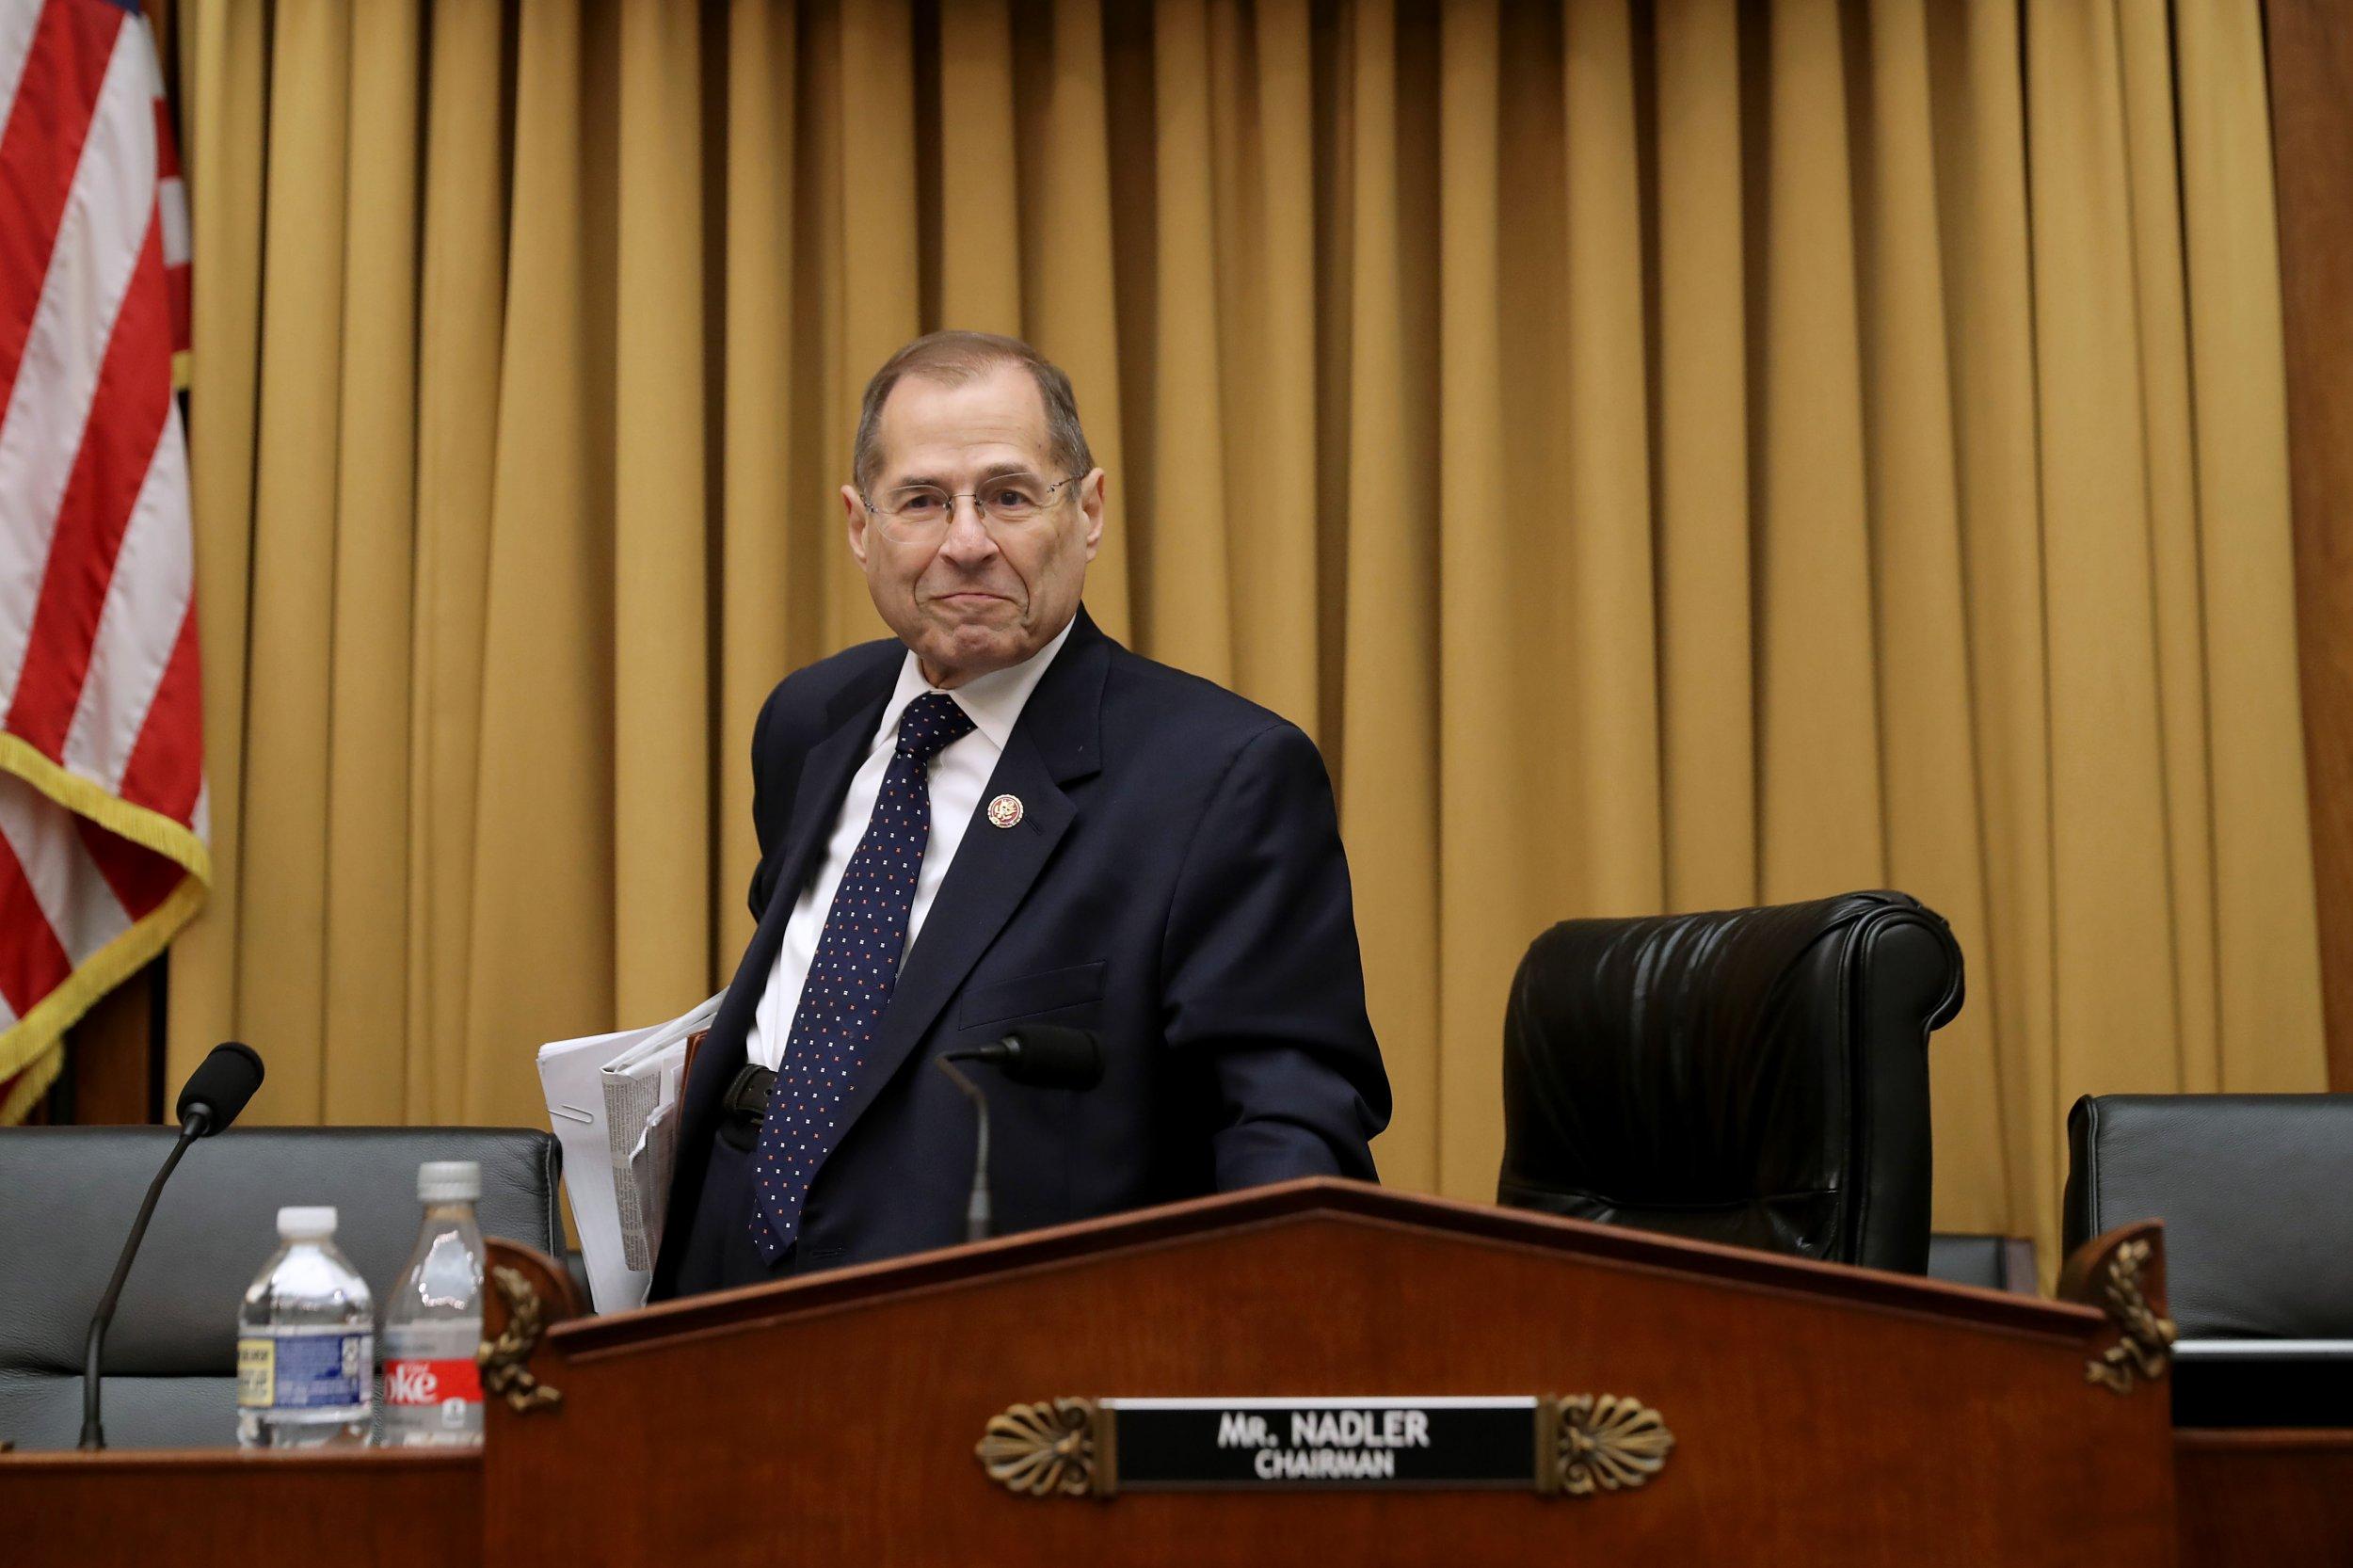 Top Democrat Jerry Nadler Threatens Large Contempt Fines